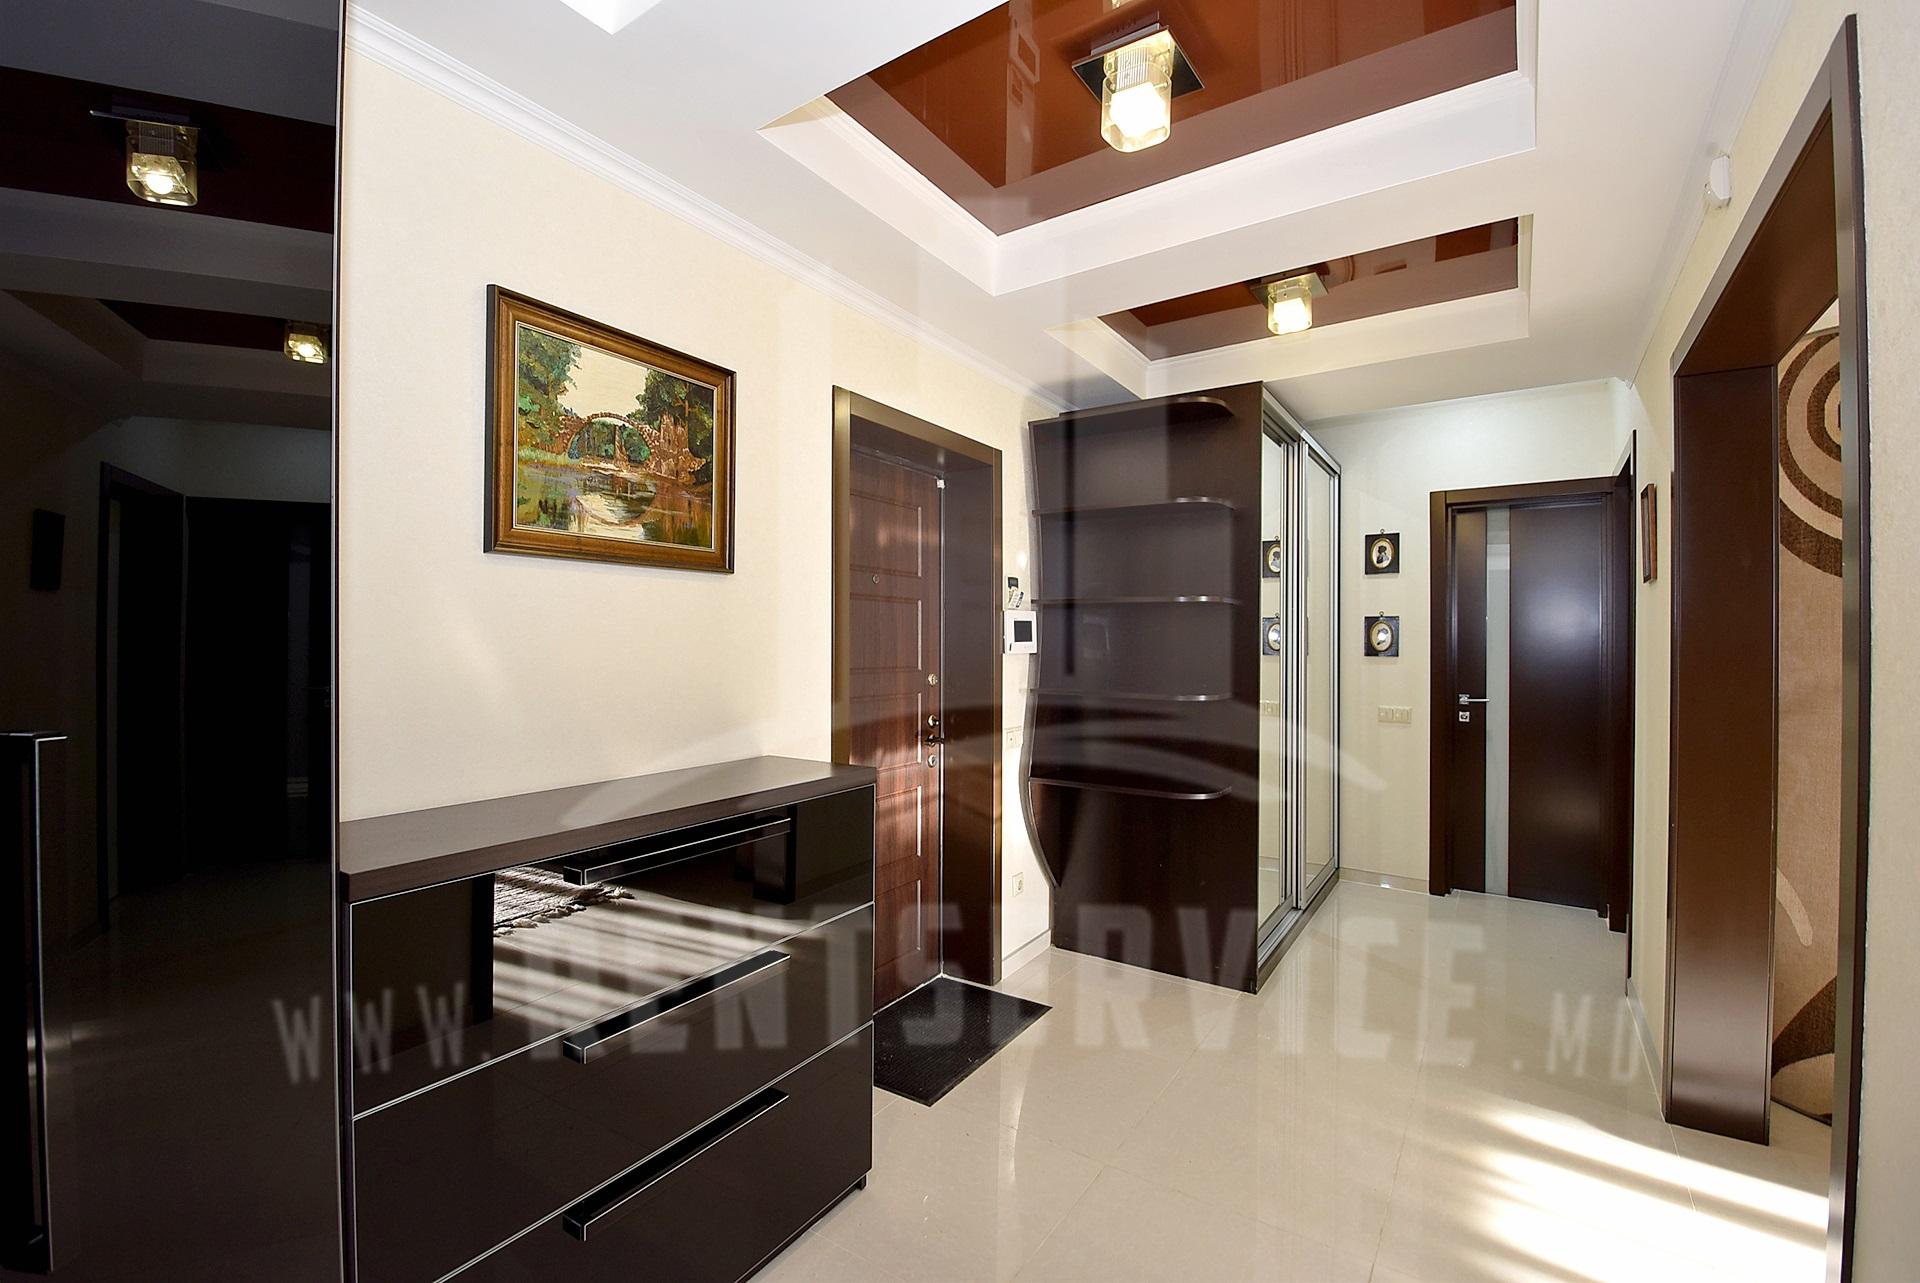 290_apartment_11.JPG